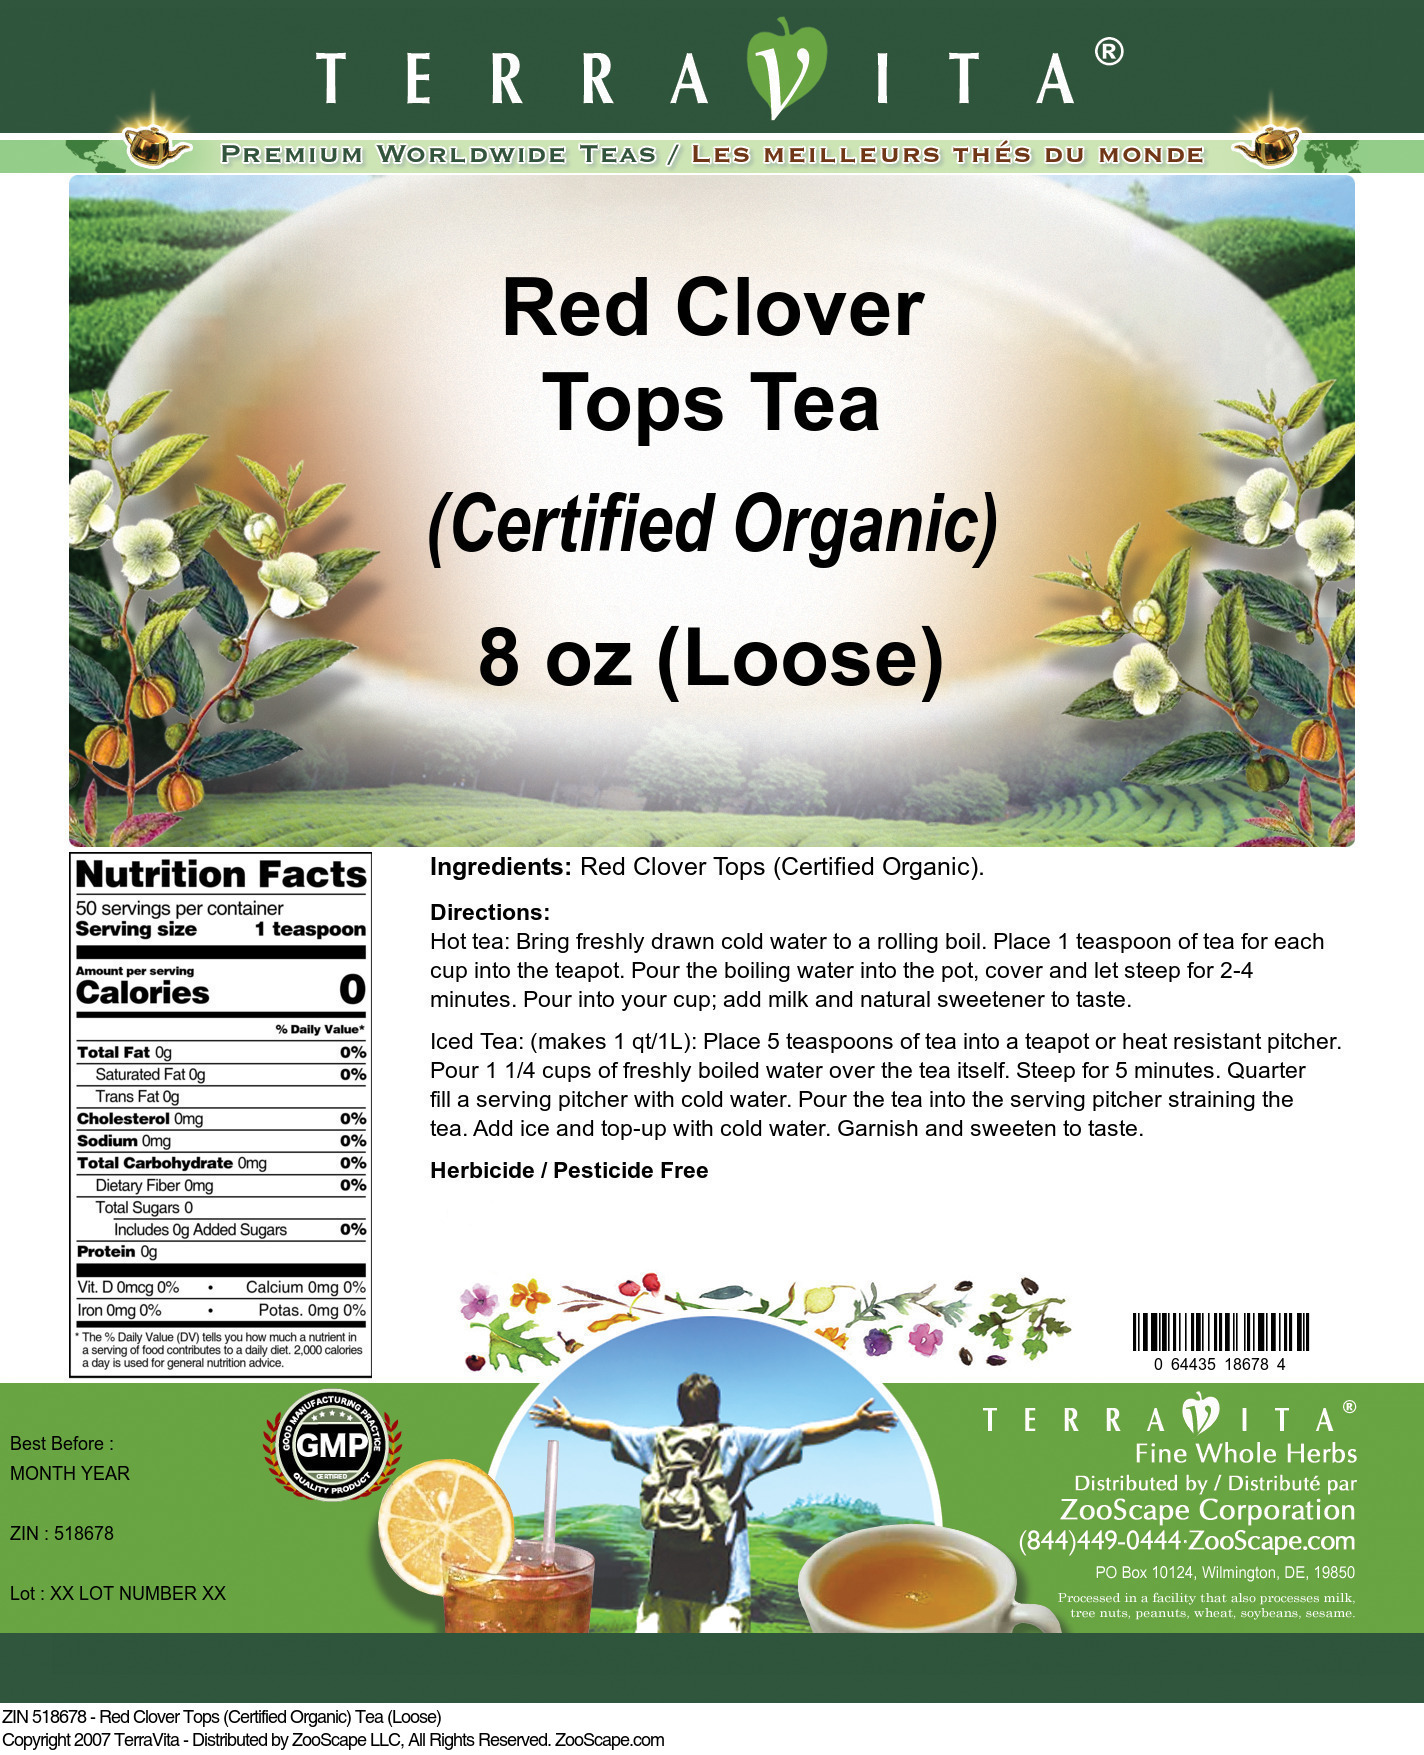 Red Clover Tops (Certified Organic) Tea (Loose)